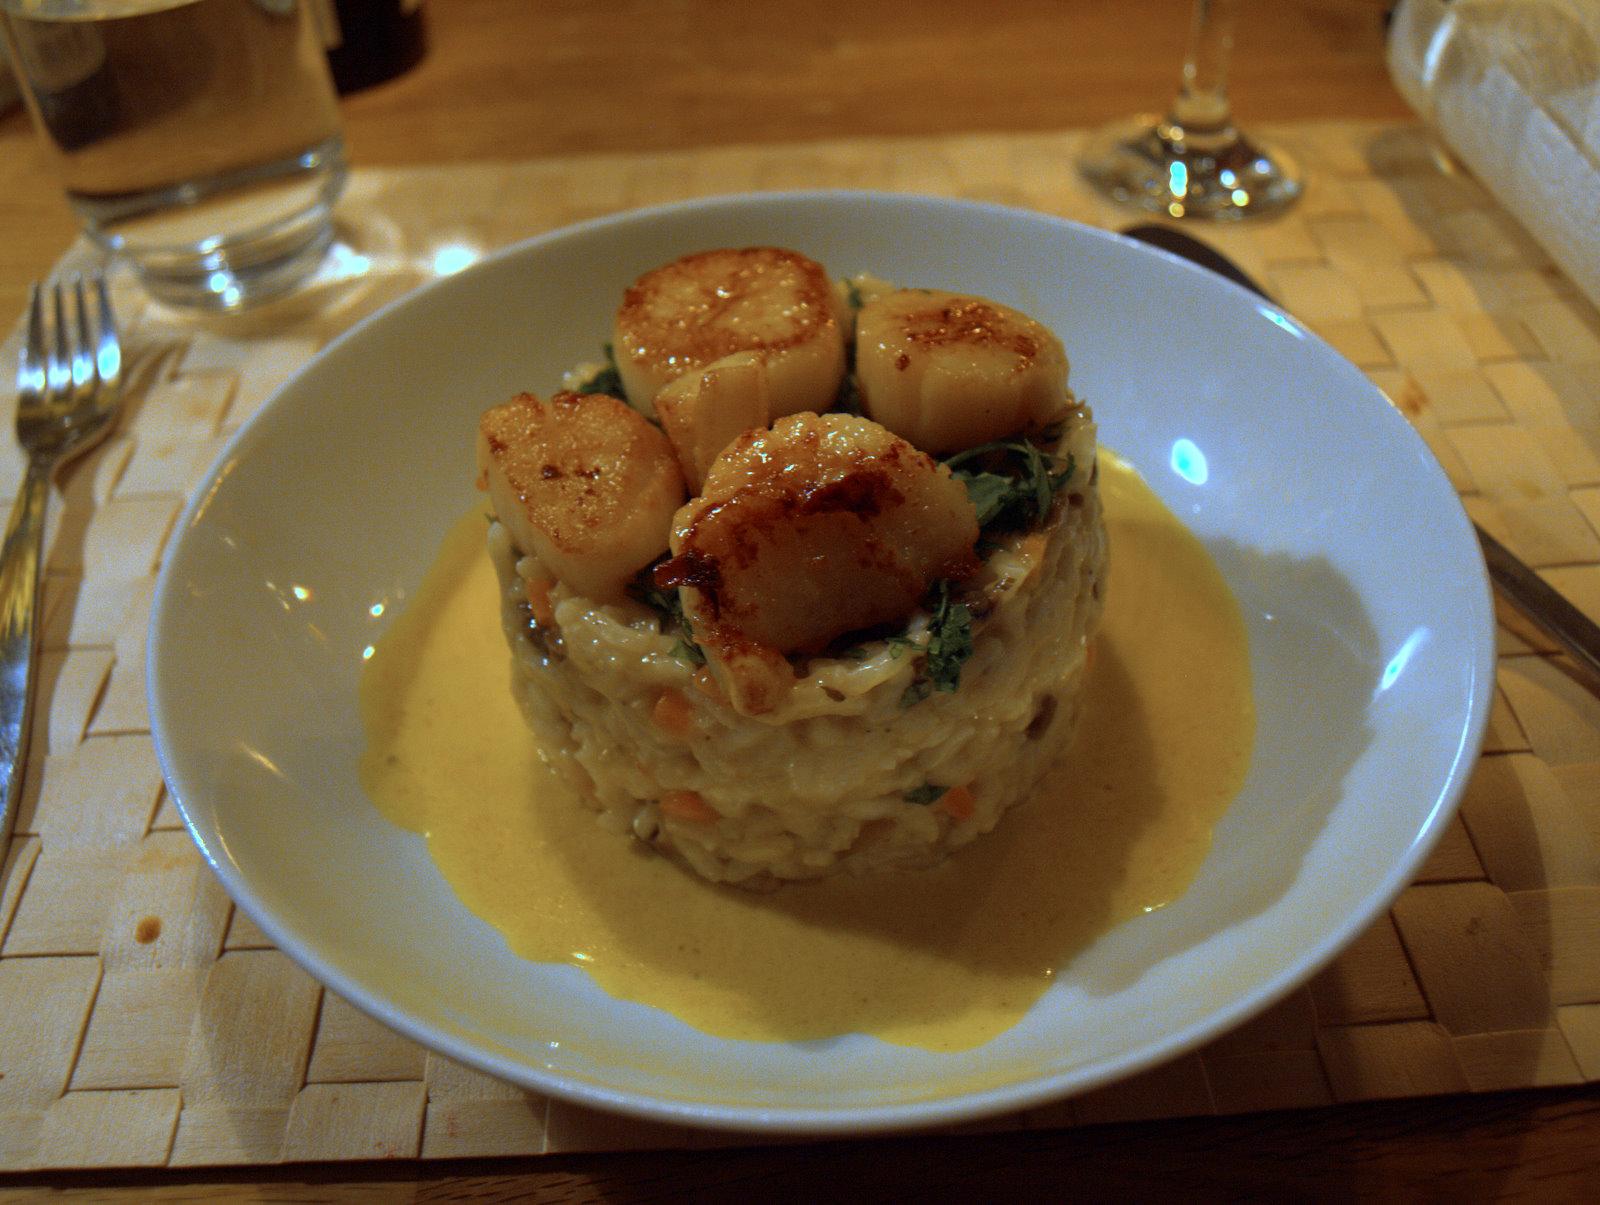 Risotto med grøntsager, stegte kammuslinger og karrysauce